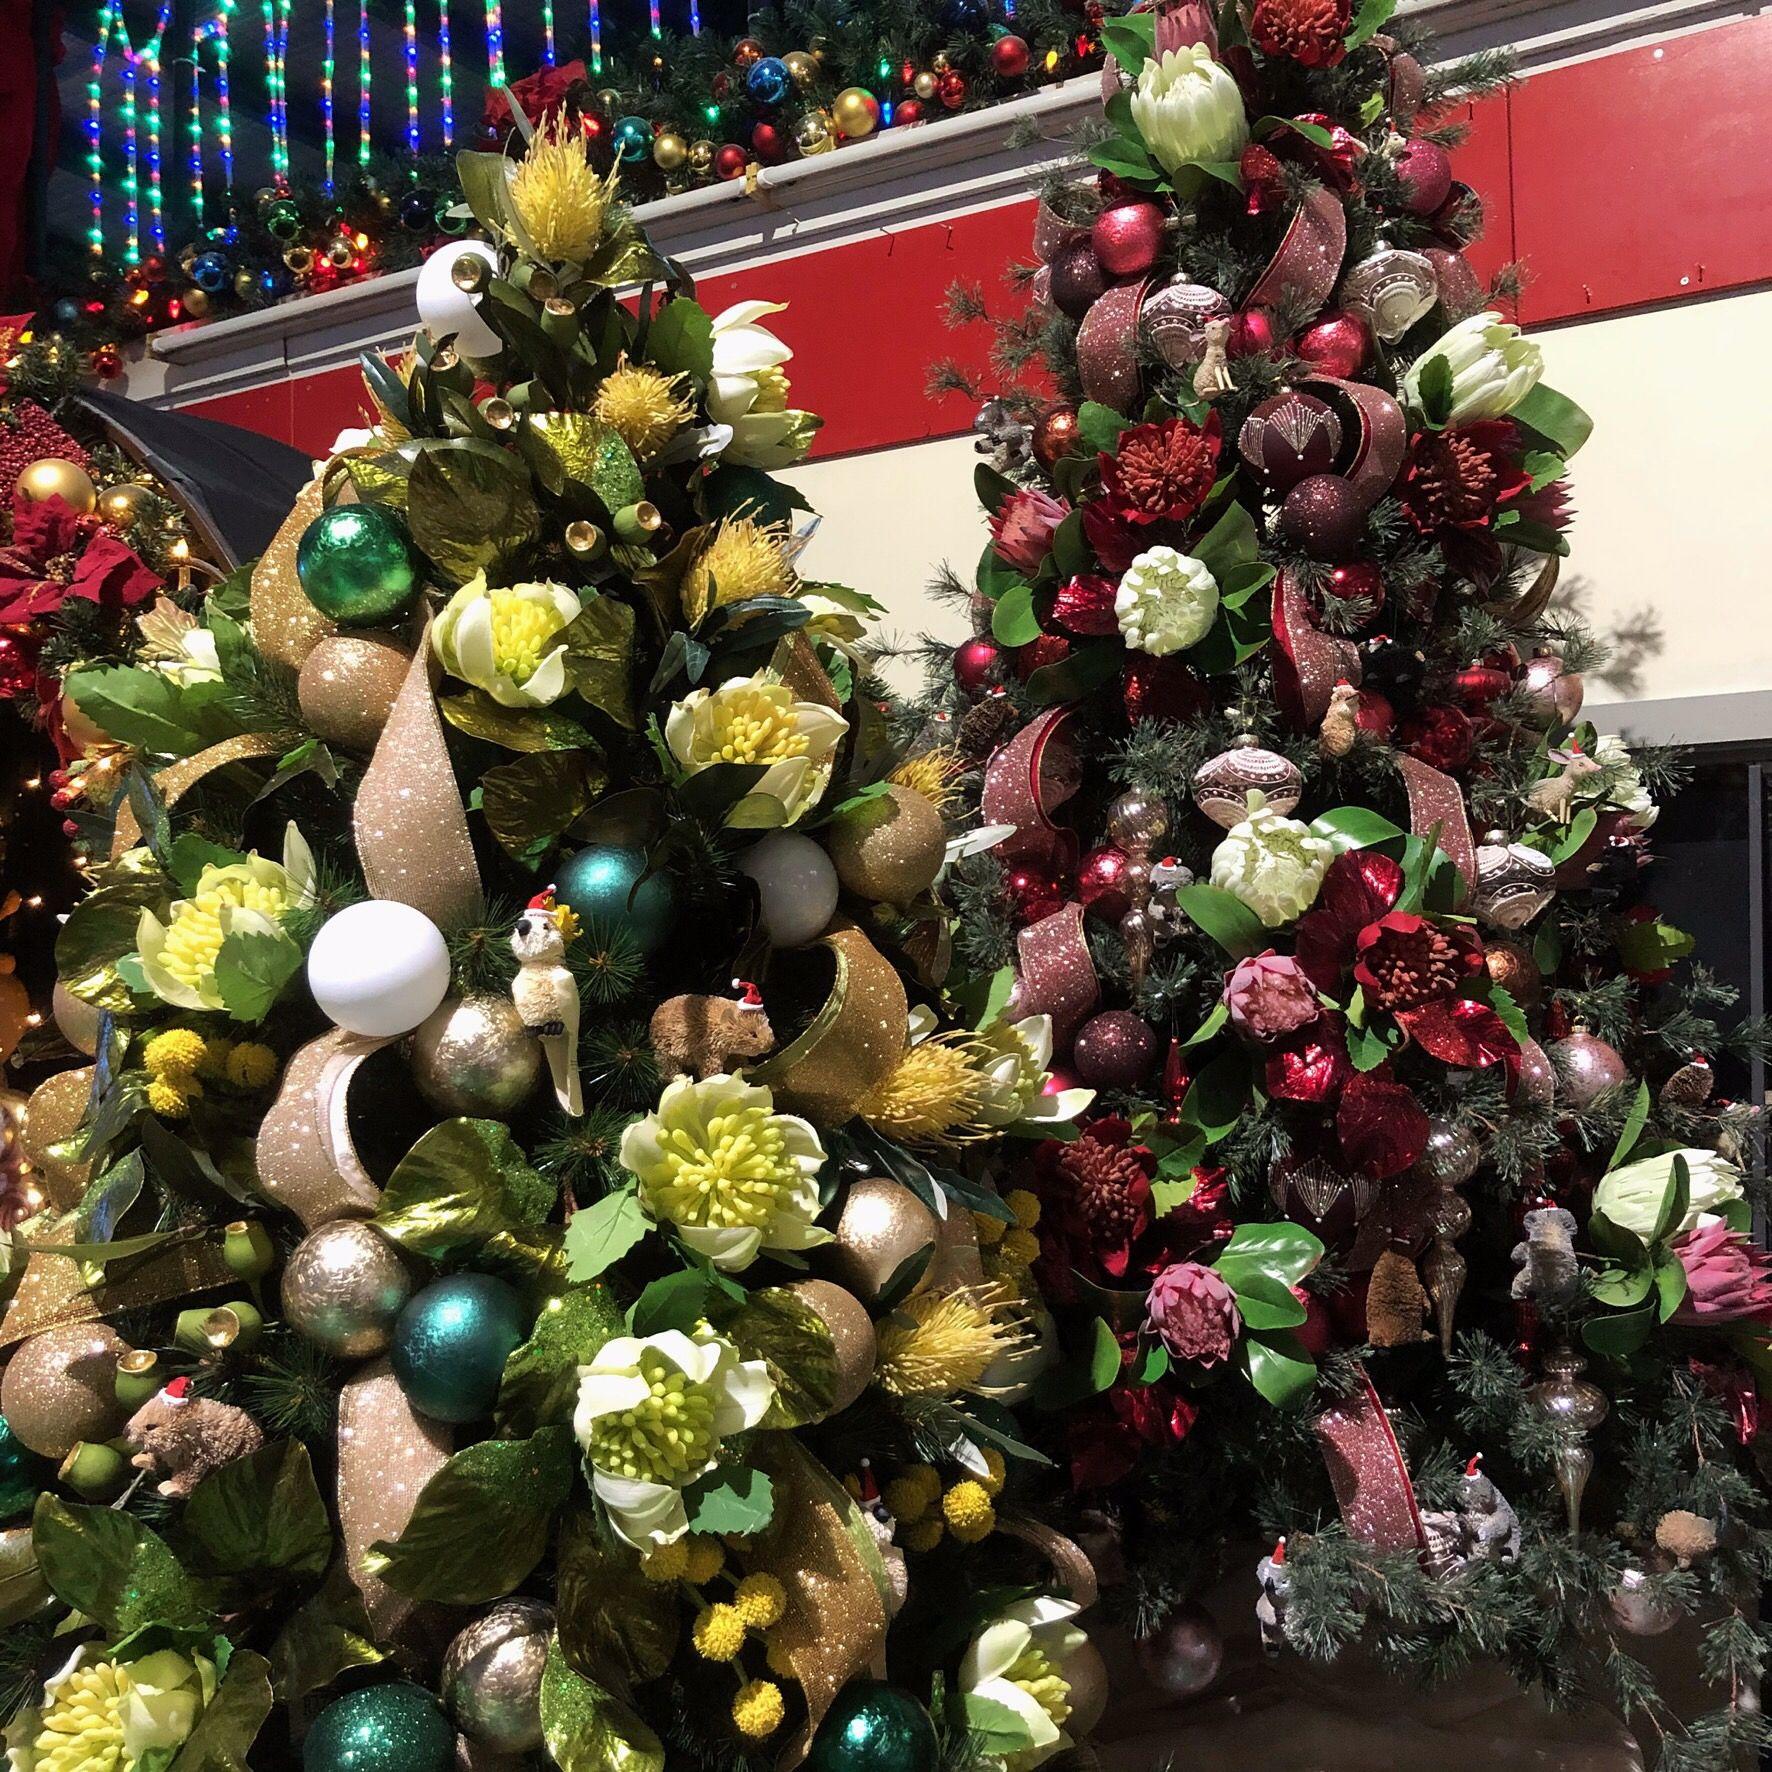 Australian Christmas trees